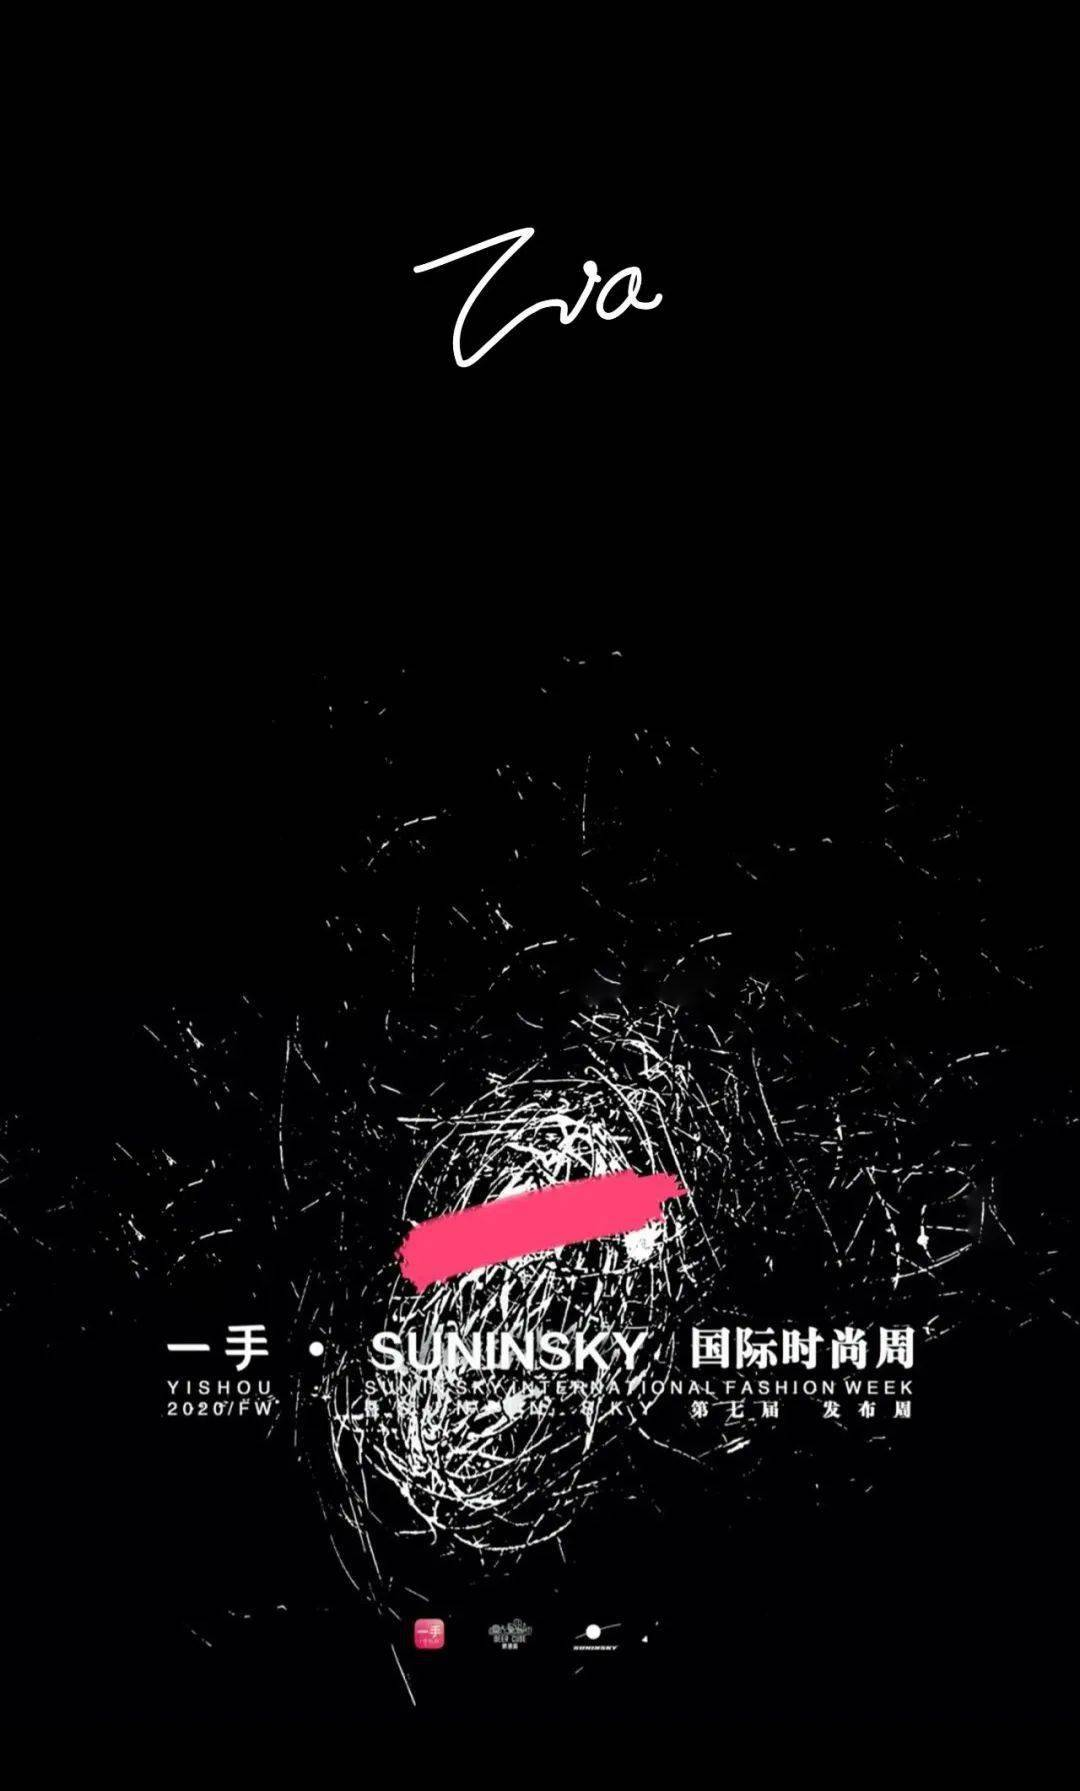 ZIA品牌专场秀 一手·SUNINSKY国际时尚周(暨SUNINSKY第七届发布周)